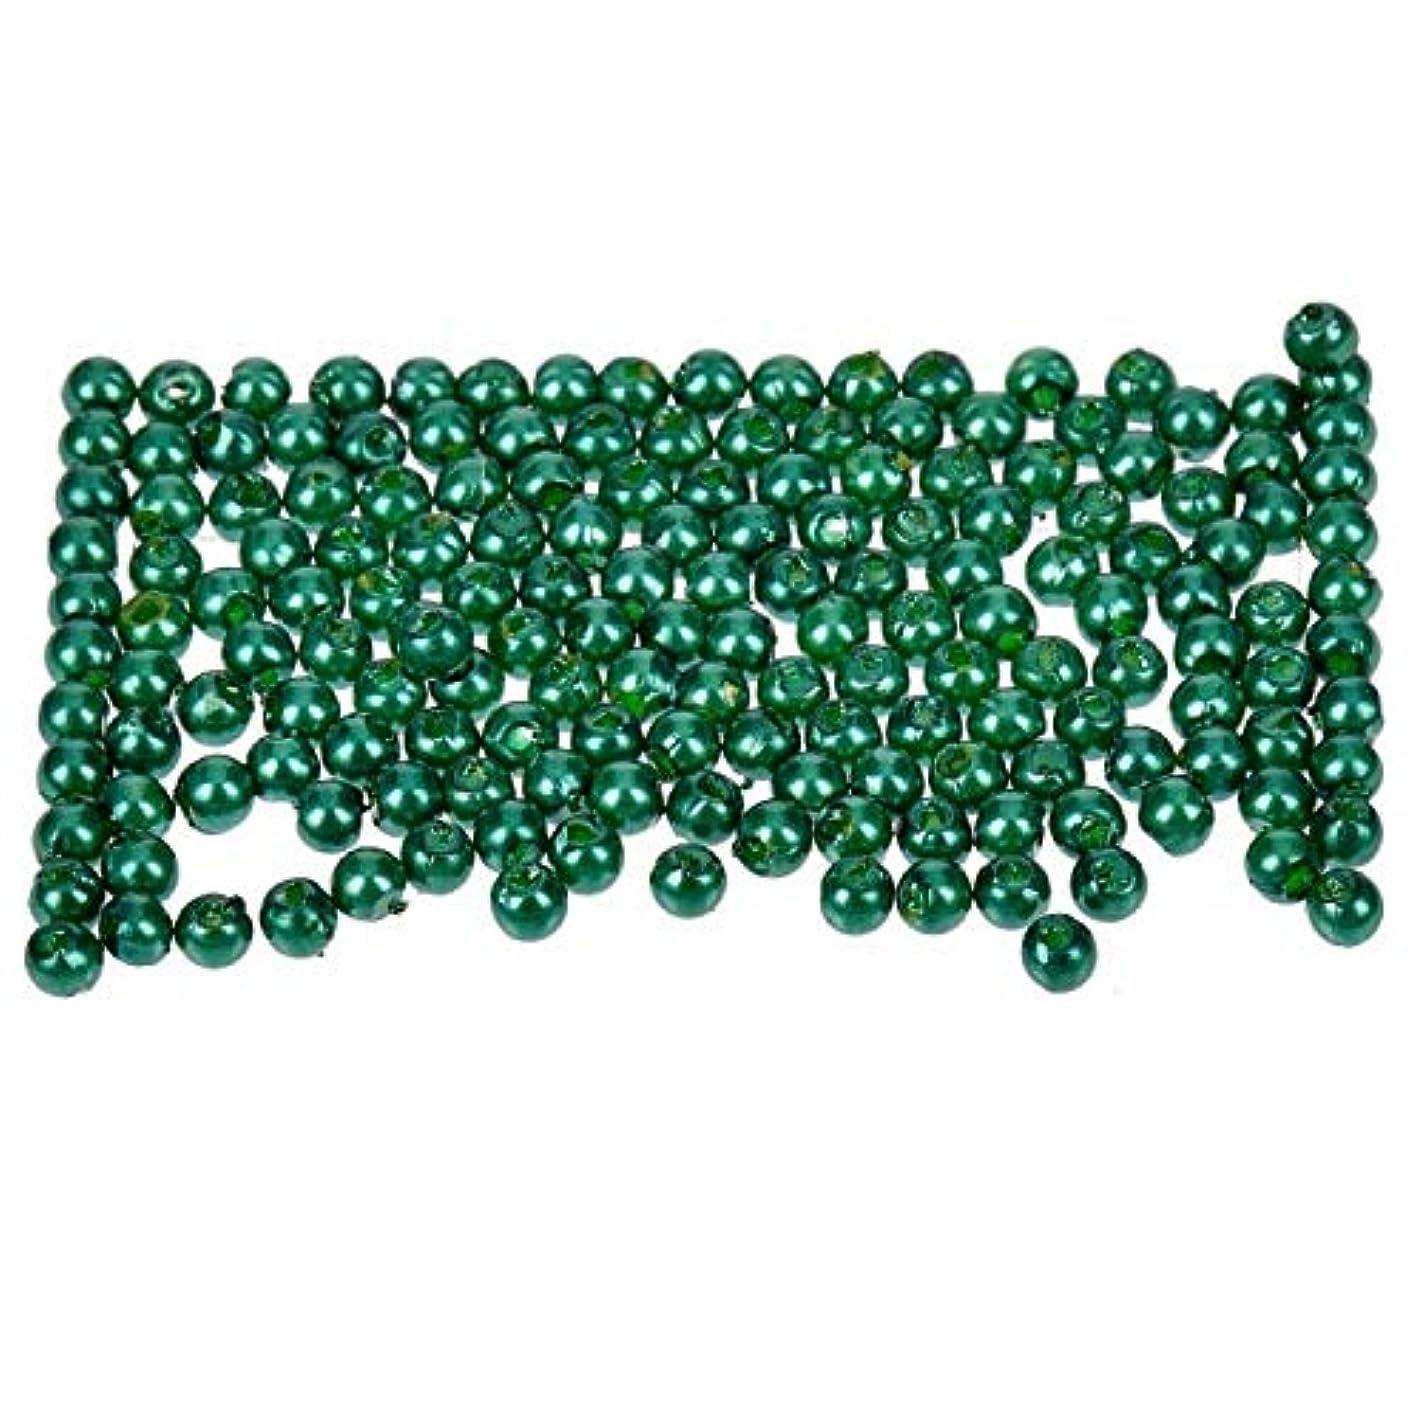 Efco Wax Beads, Plastic, Green, 3 mm Diameter, 125-Piece